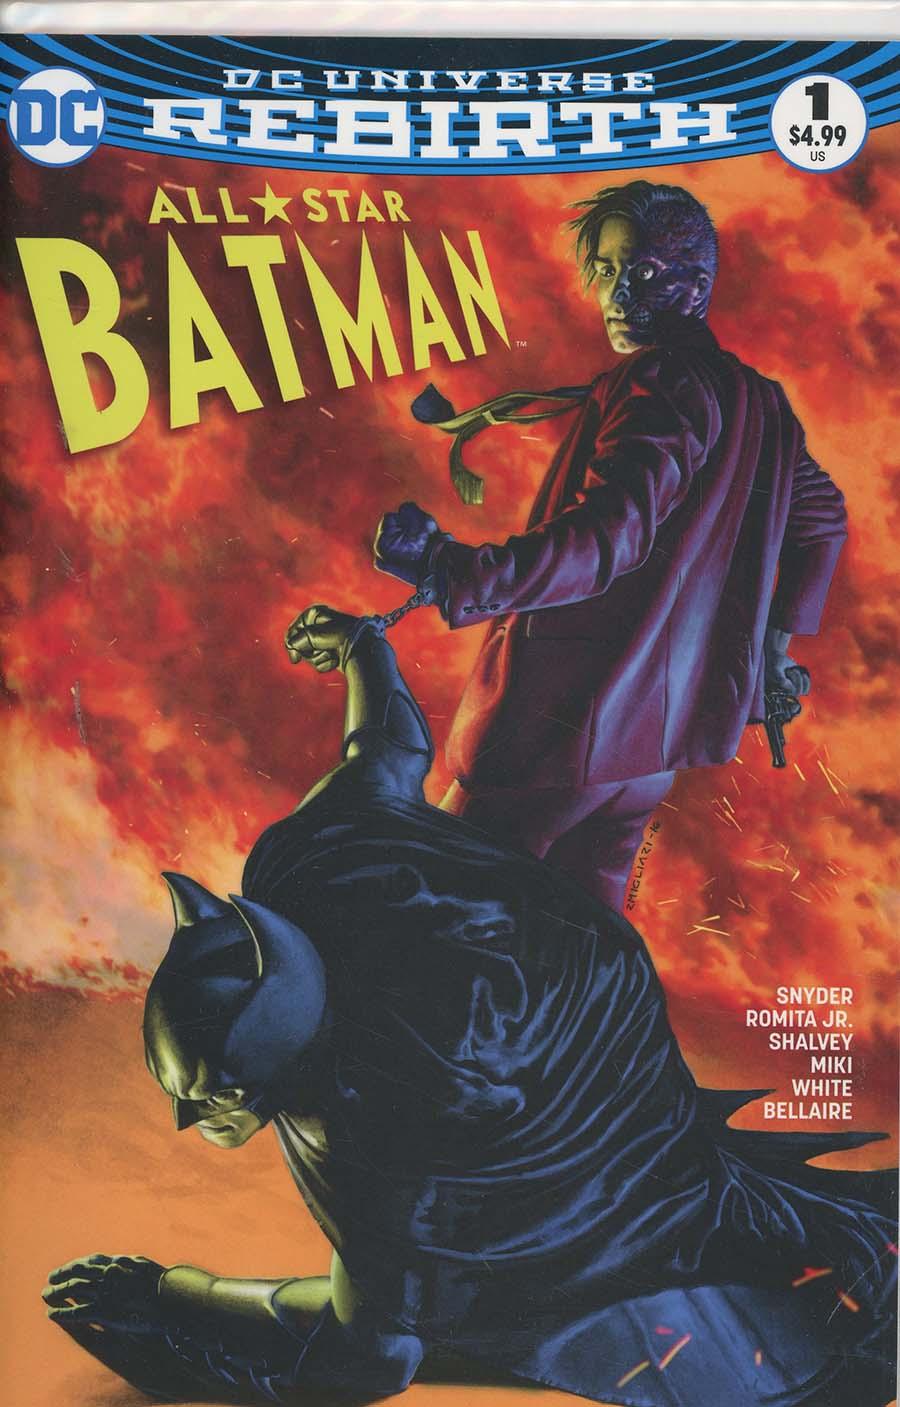 All-Star Batman #1 Cover O DF AOD Collectables Exclusive Rudolfo Migliari Variant Cover